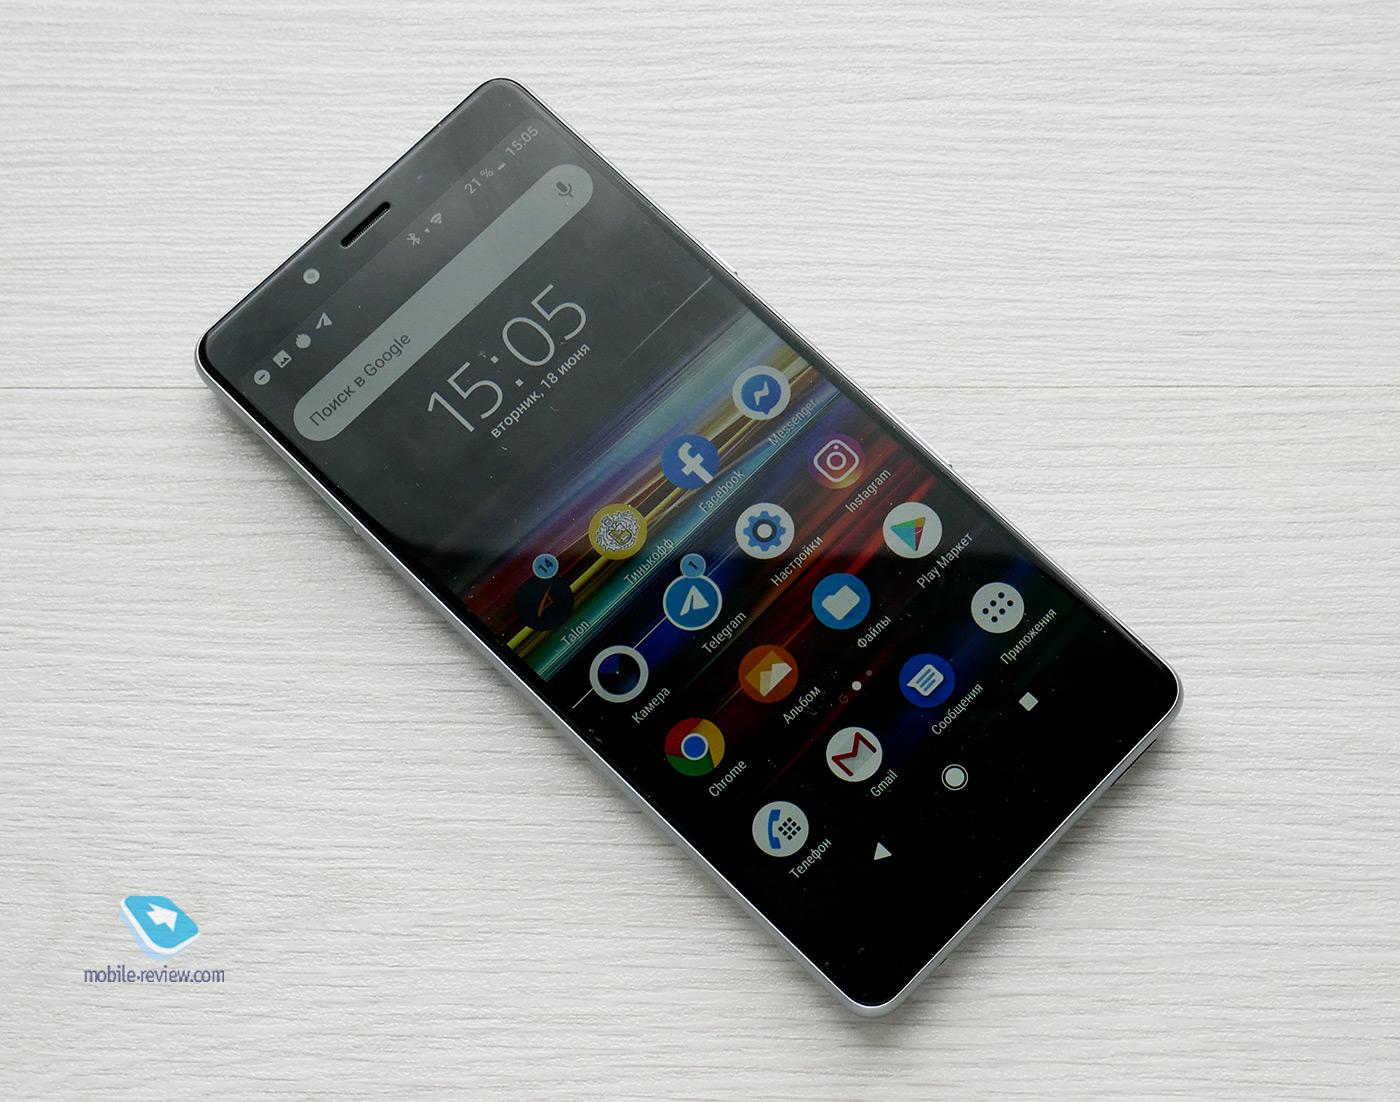 2b4ab3b43daa5 Mobile-review.com Обзор смартфона Sony Xperia L3